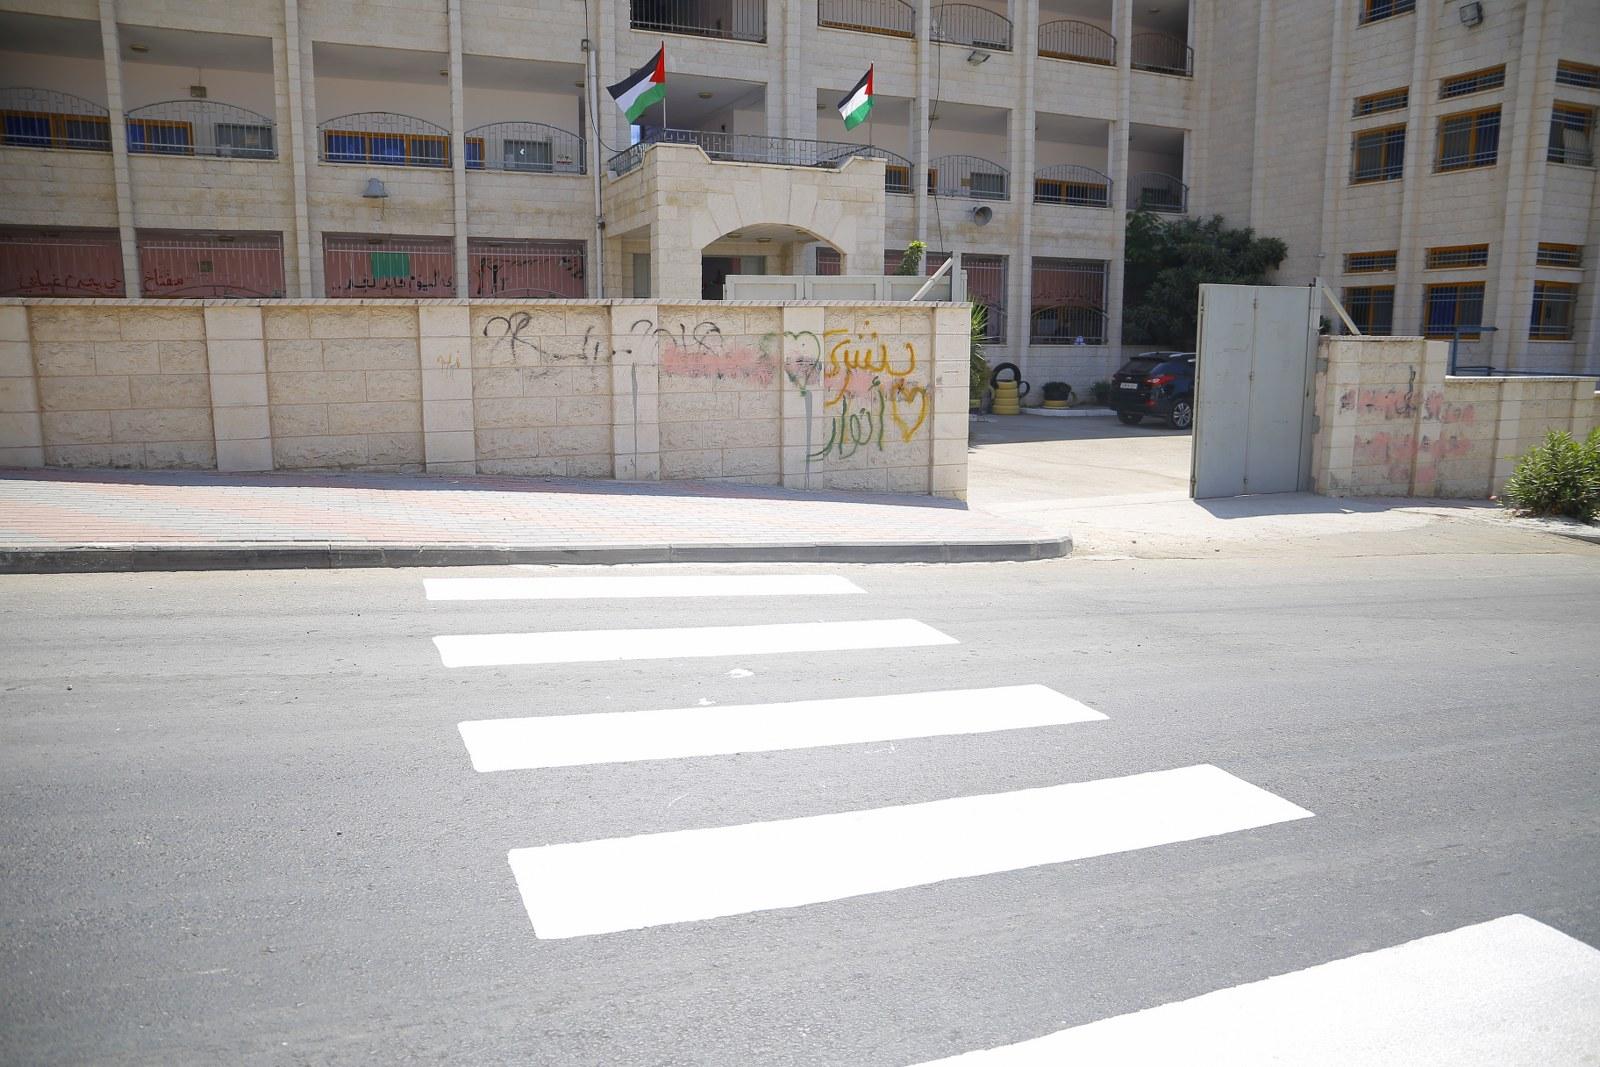 أعمال تخطيط شوارع وممرات مشاه